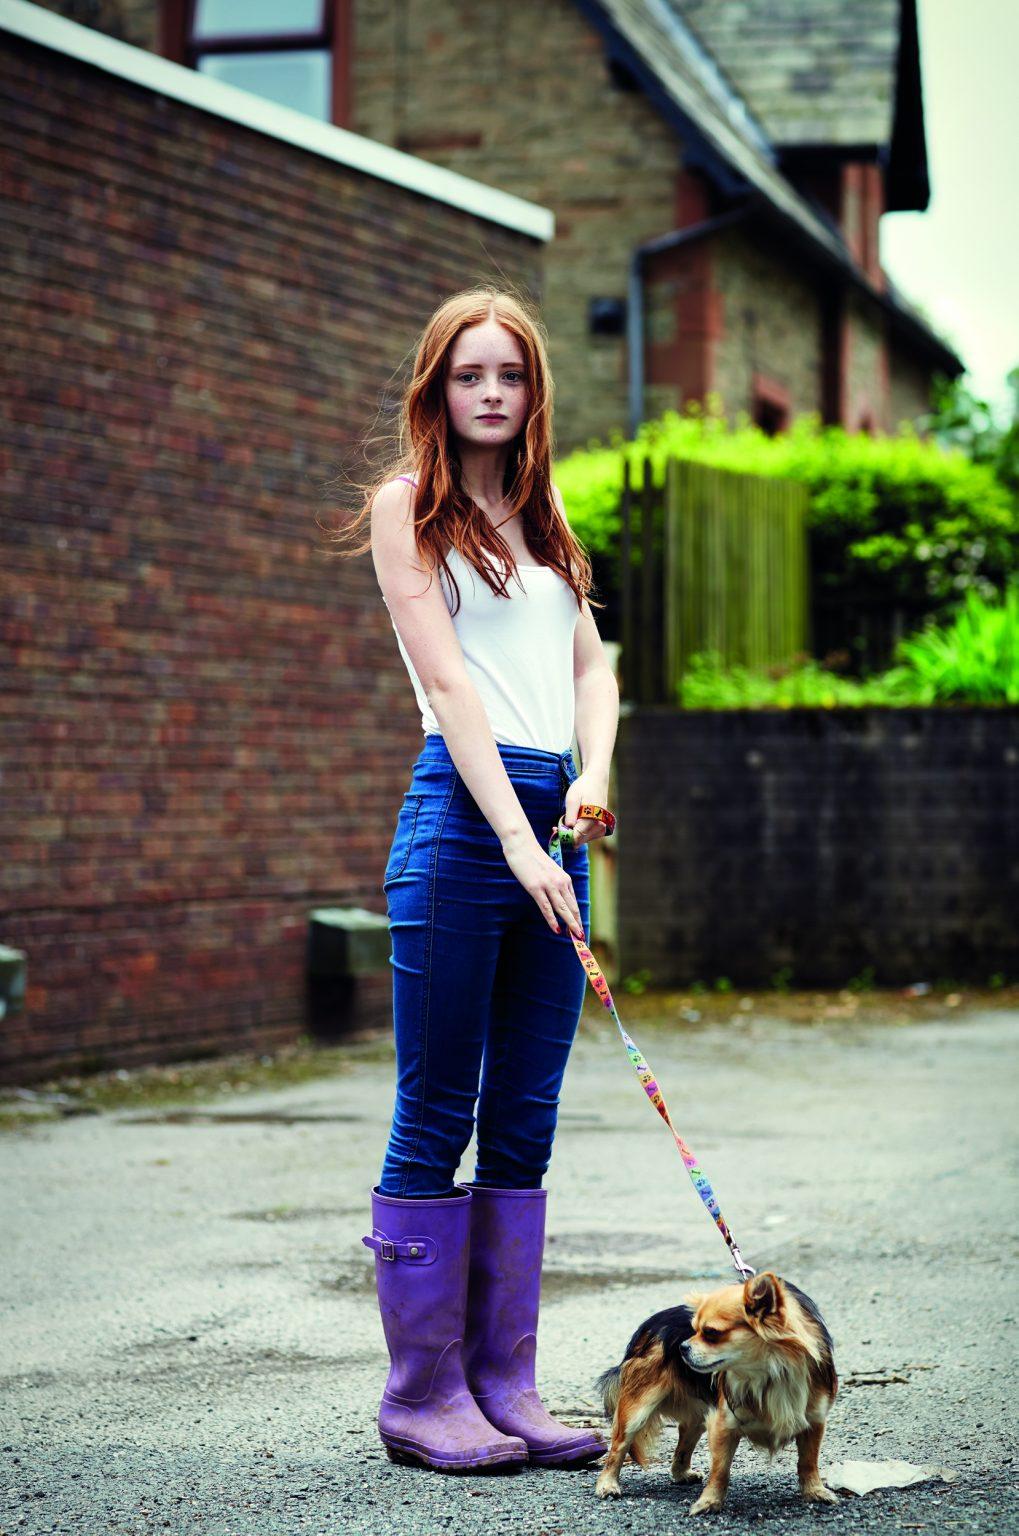 Appleby, United Kingdom, June 2014 - Appleby Horse Fair. Maddie Ratcliffe. ><  Appleby, Regno Unito, giugno 2014 - Appleby Horse Fair. Maddie Ratcliffe. *** Local Caption ***